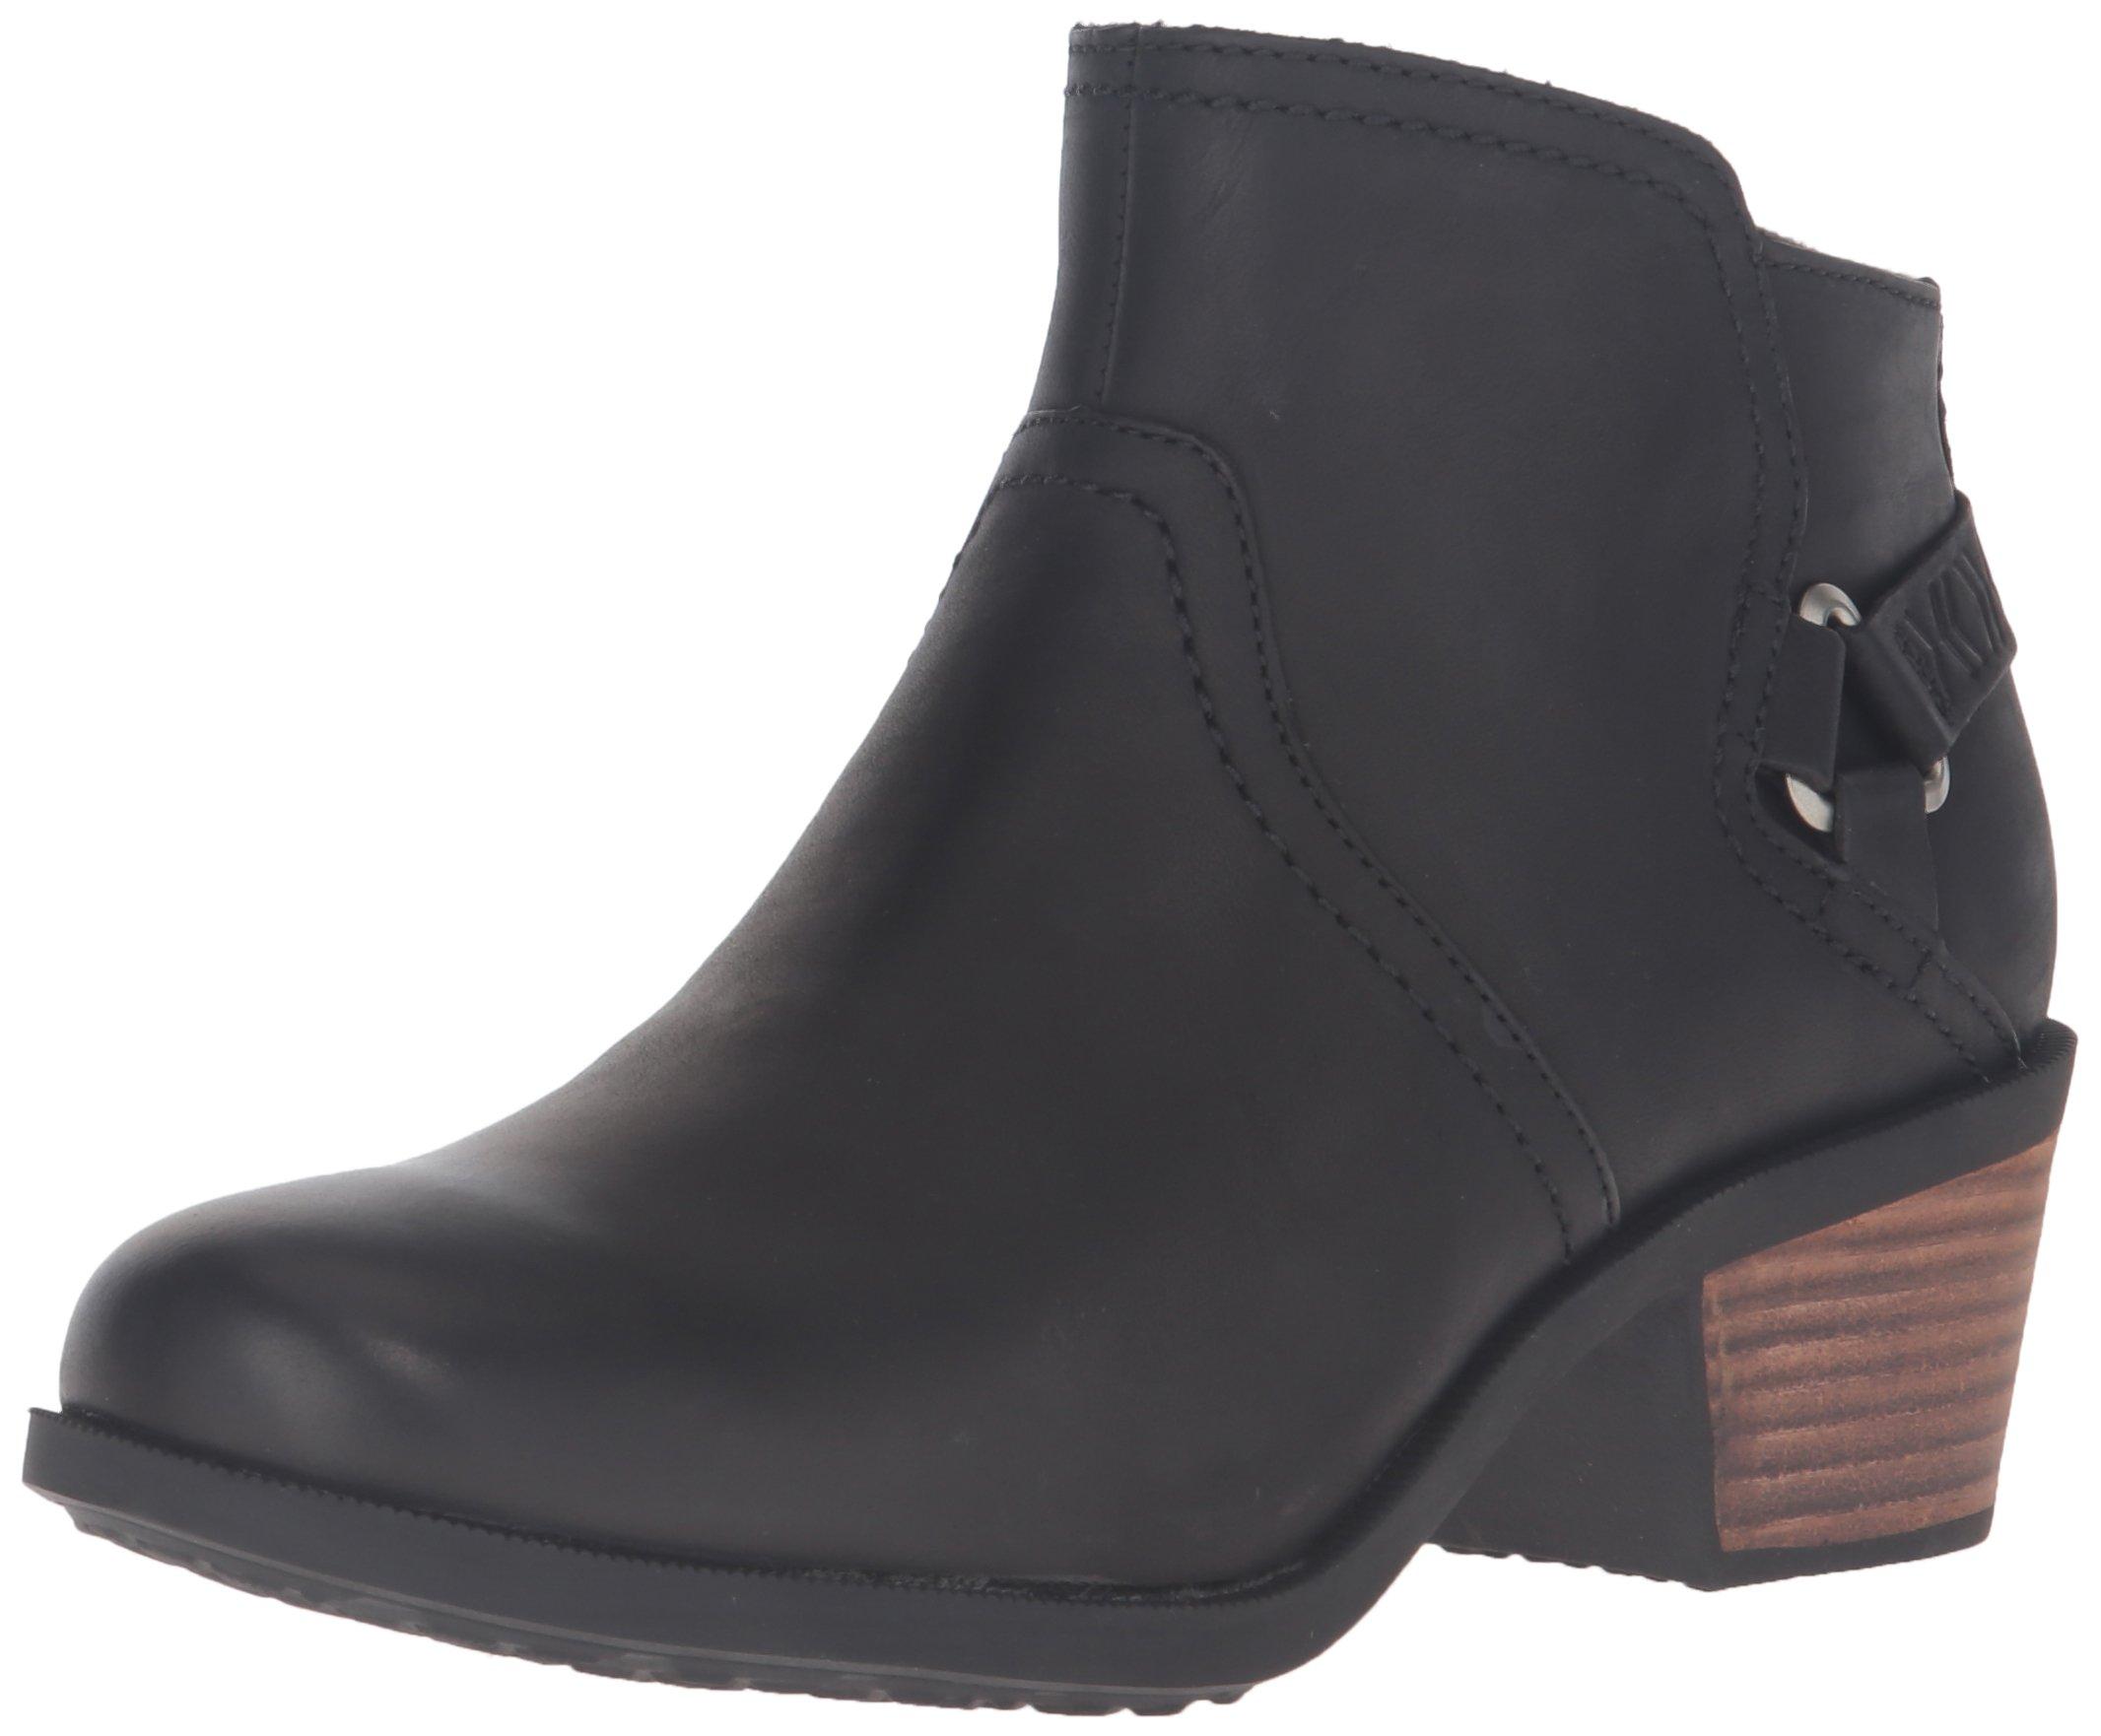 Teva Women's W Foxy Leather Boot, Black, 7.5 M US